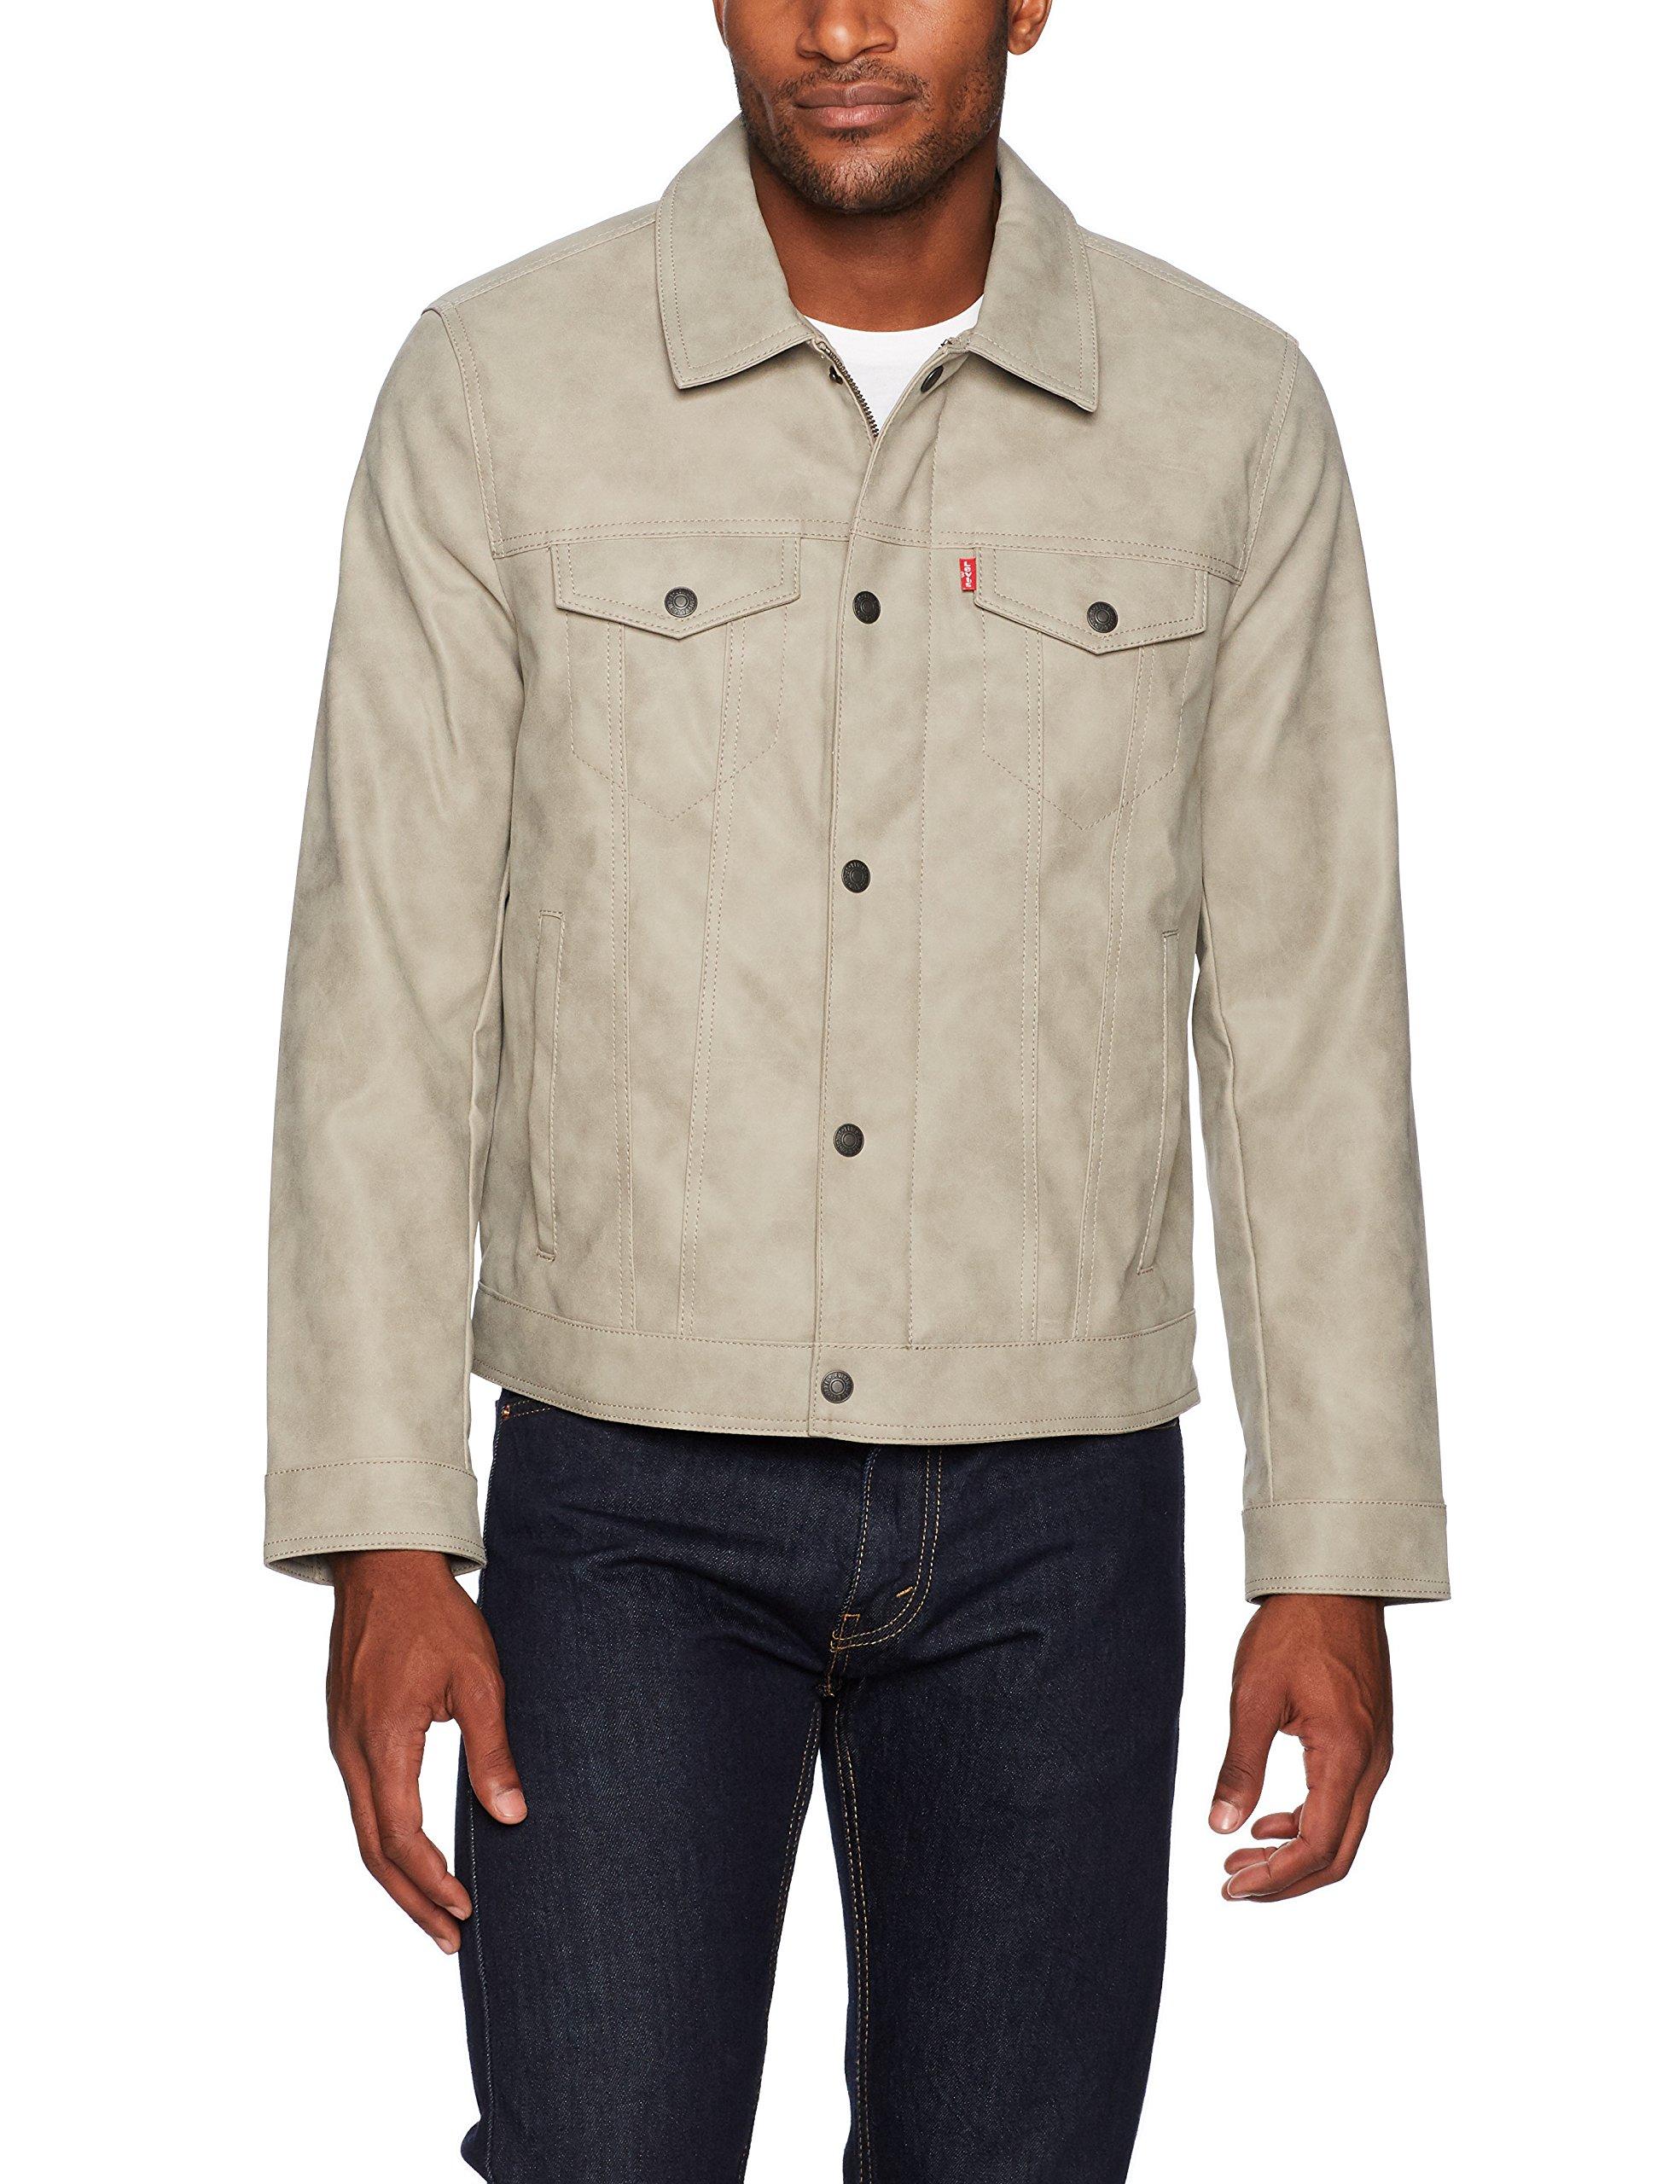 Levi's Men's Suede Touch Trucker Jacket, Light Grey, Medium by Levi's